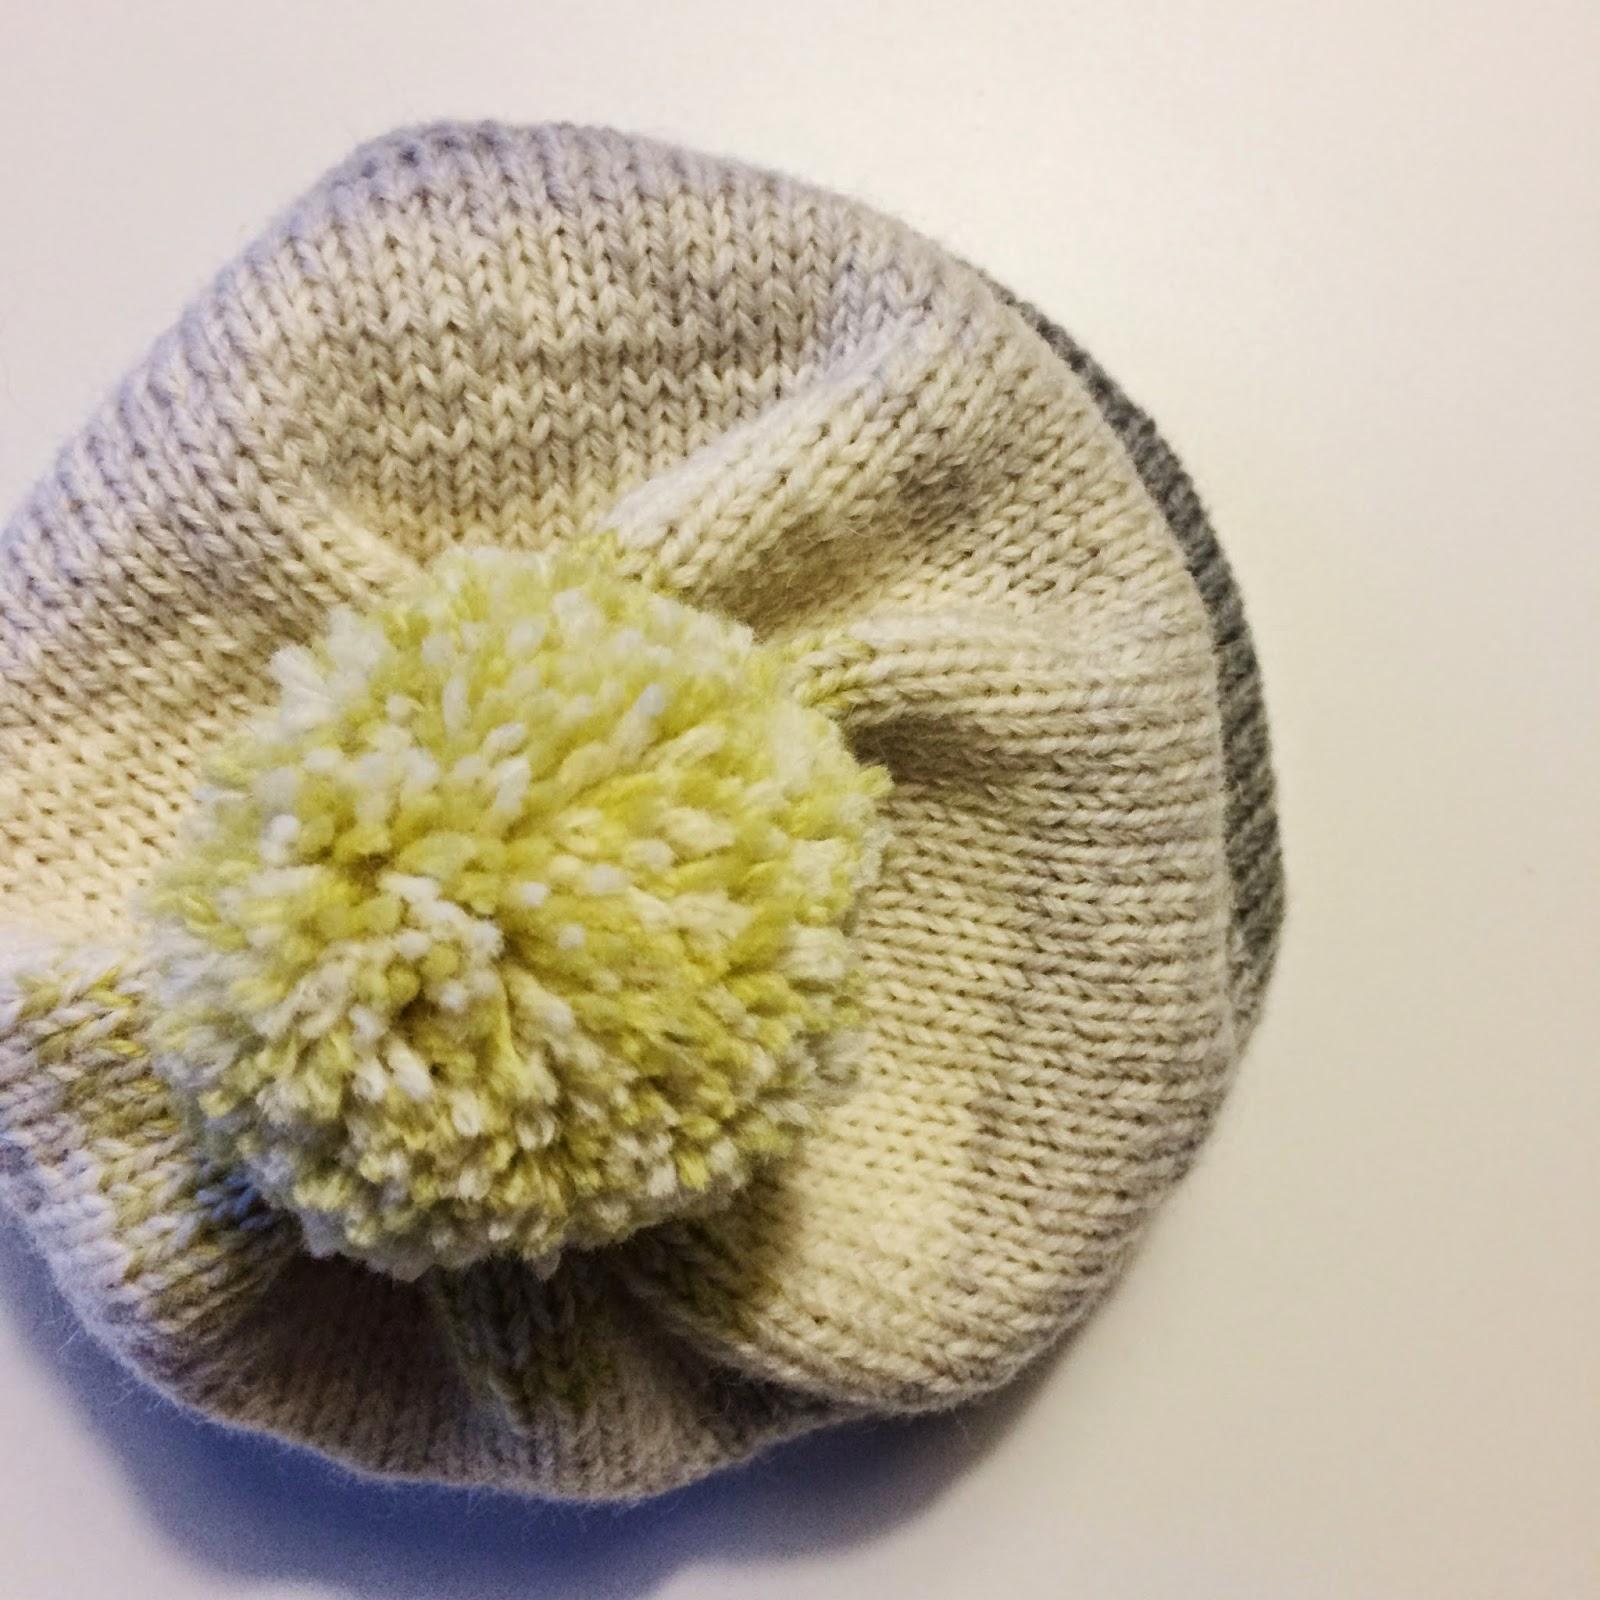 Bobs beanie - easy knitting pattern free